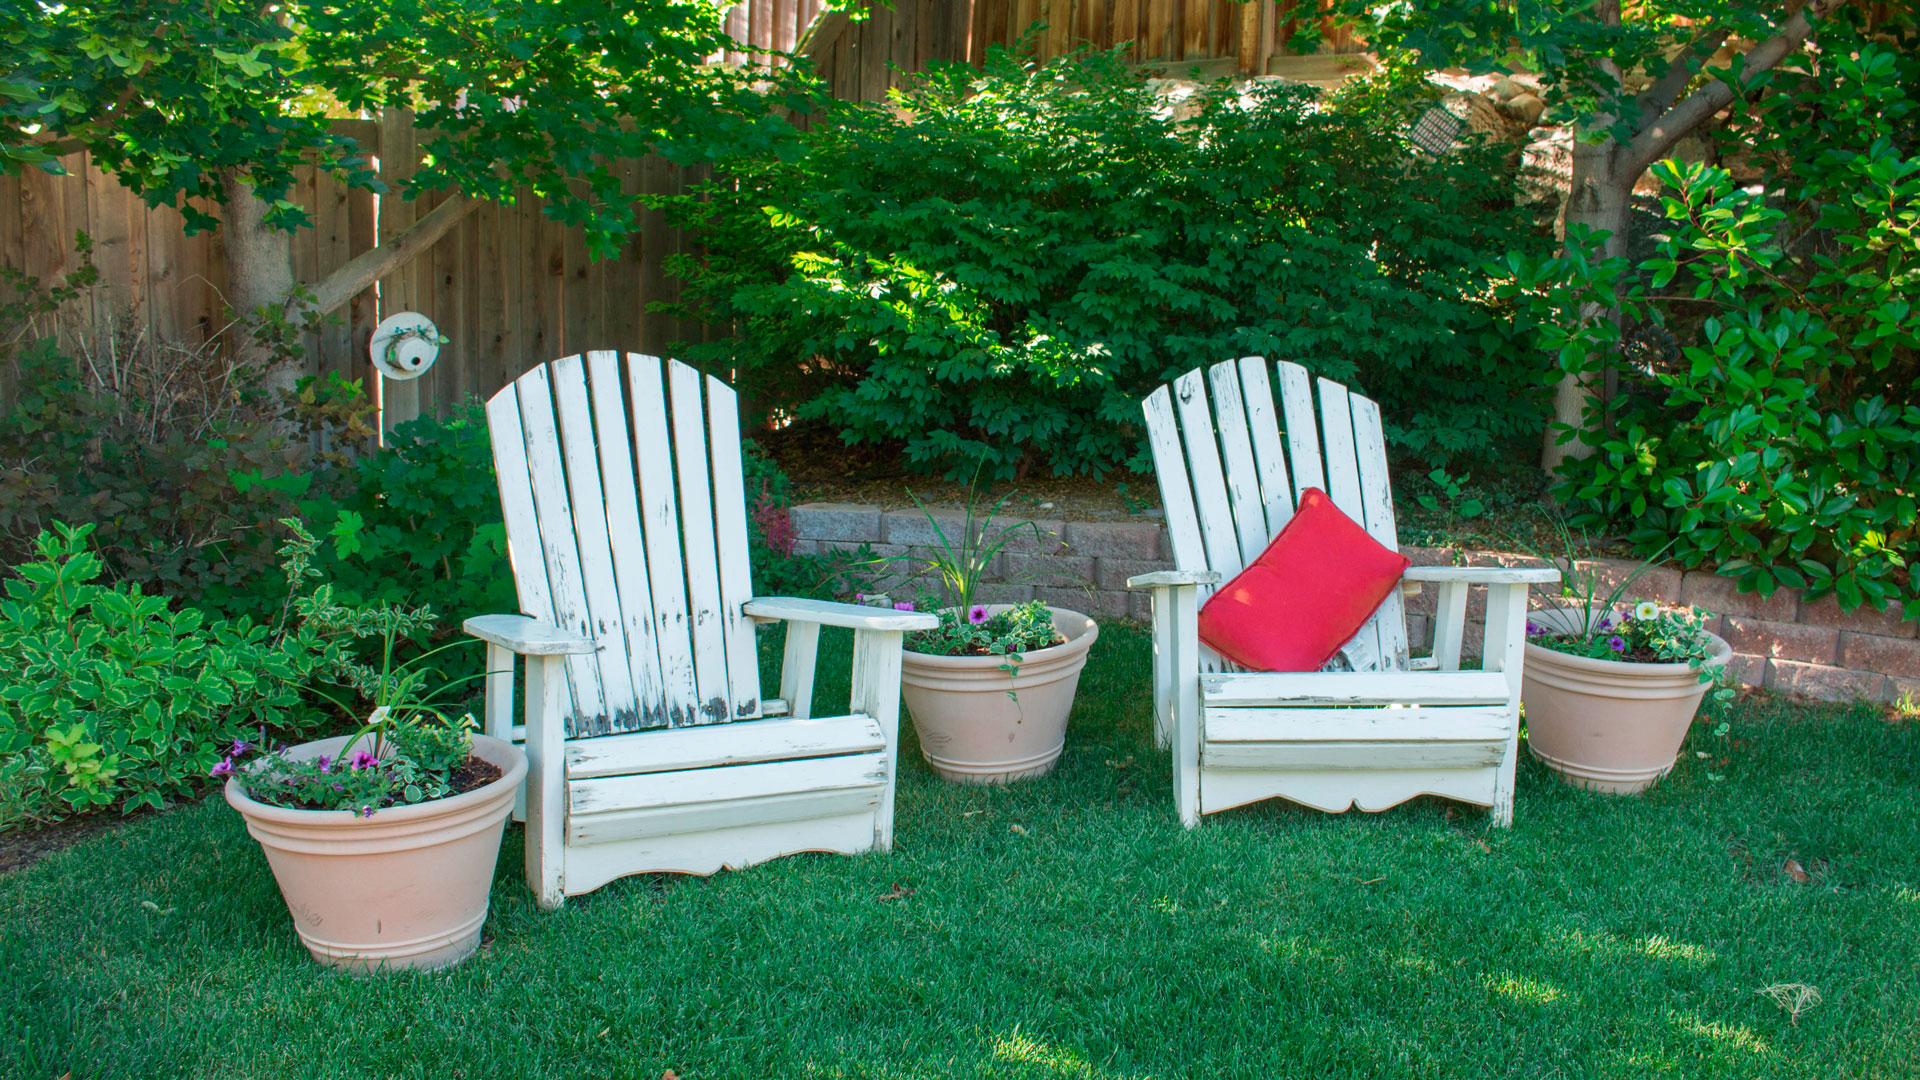 Protege los muebles de madera del exterior - Muebles exterior madera ...